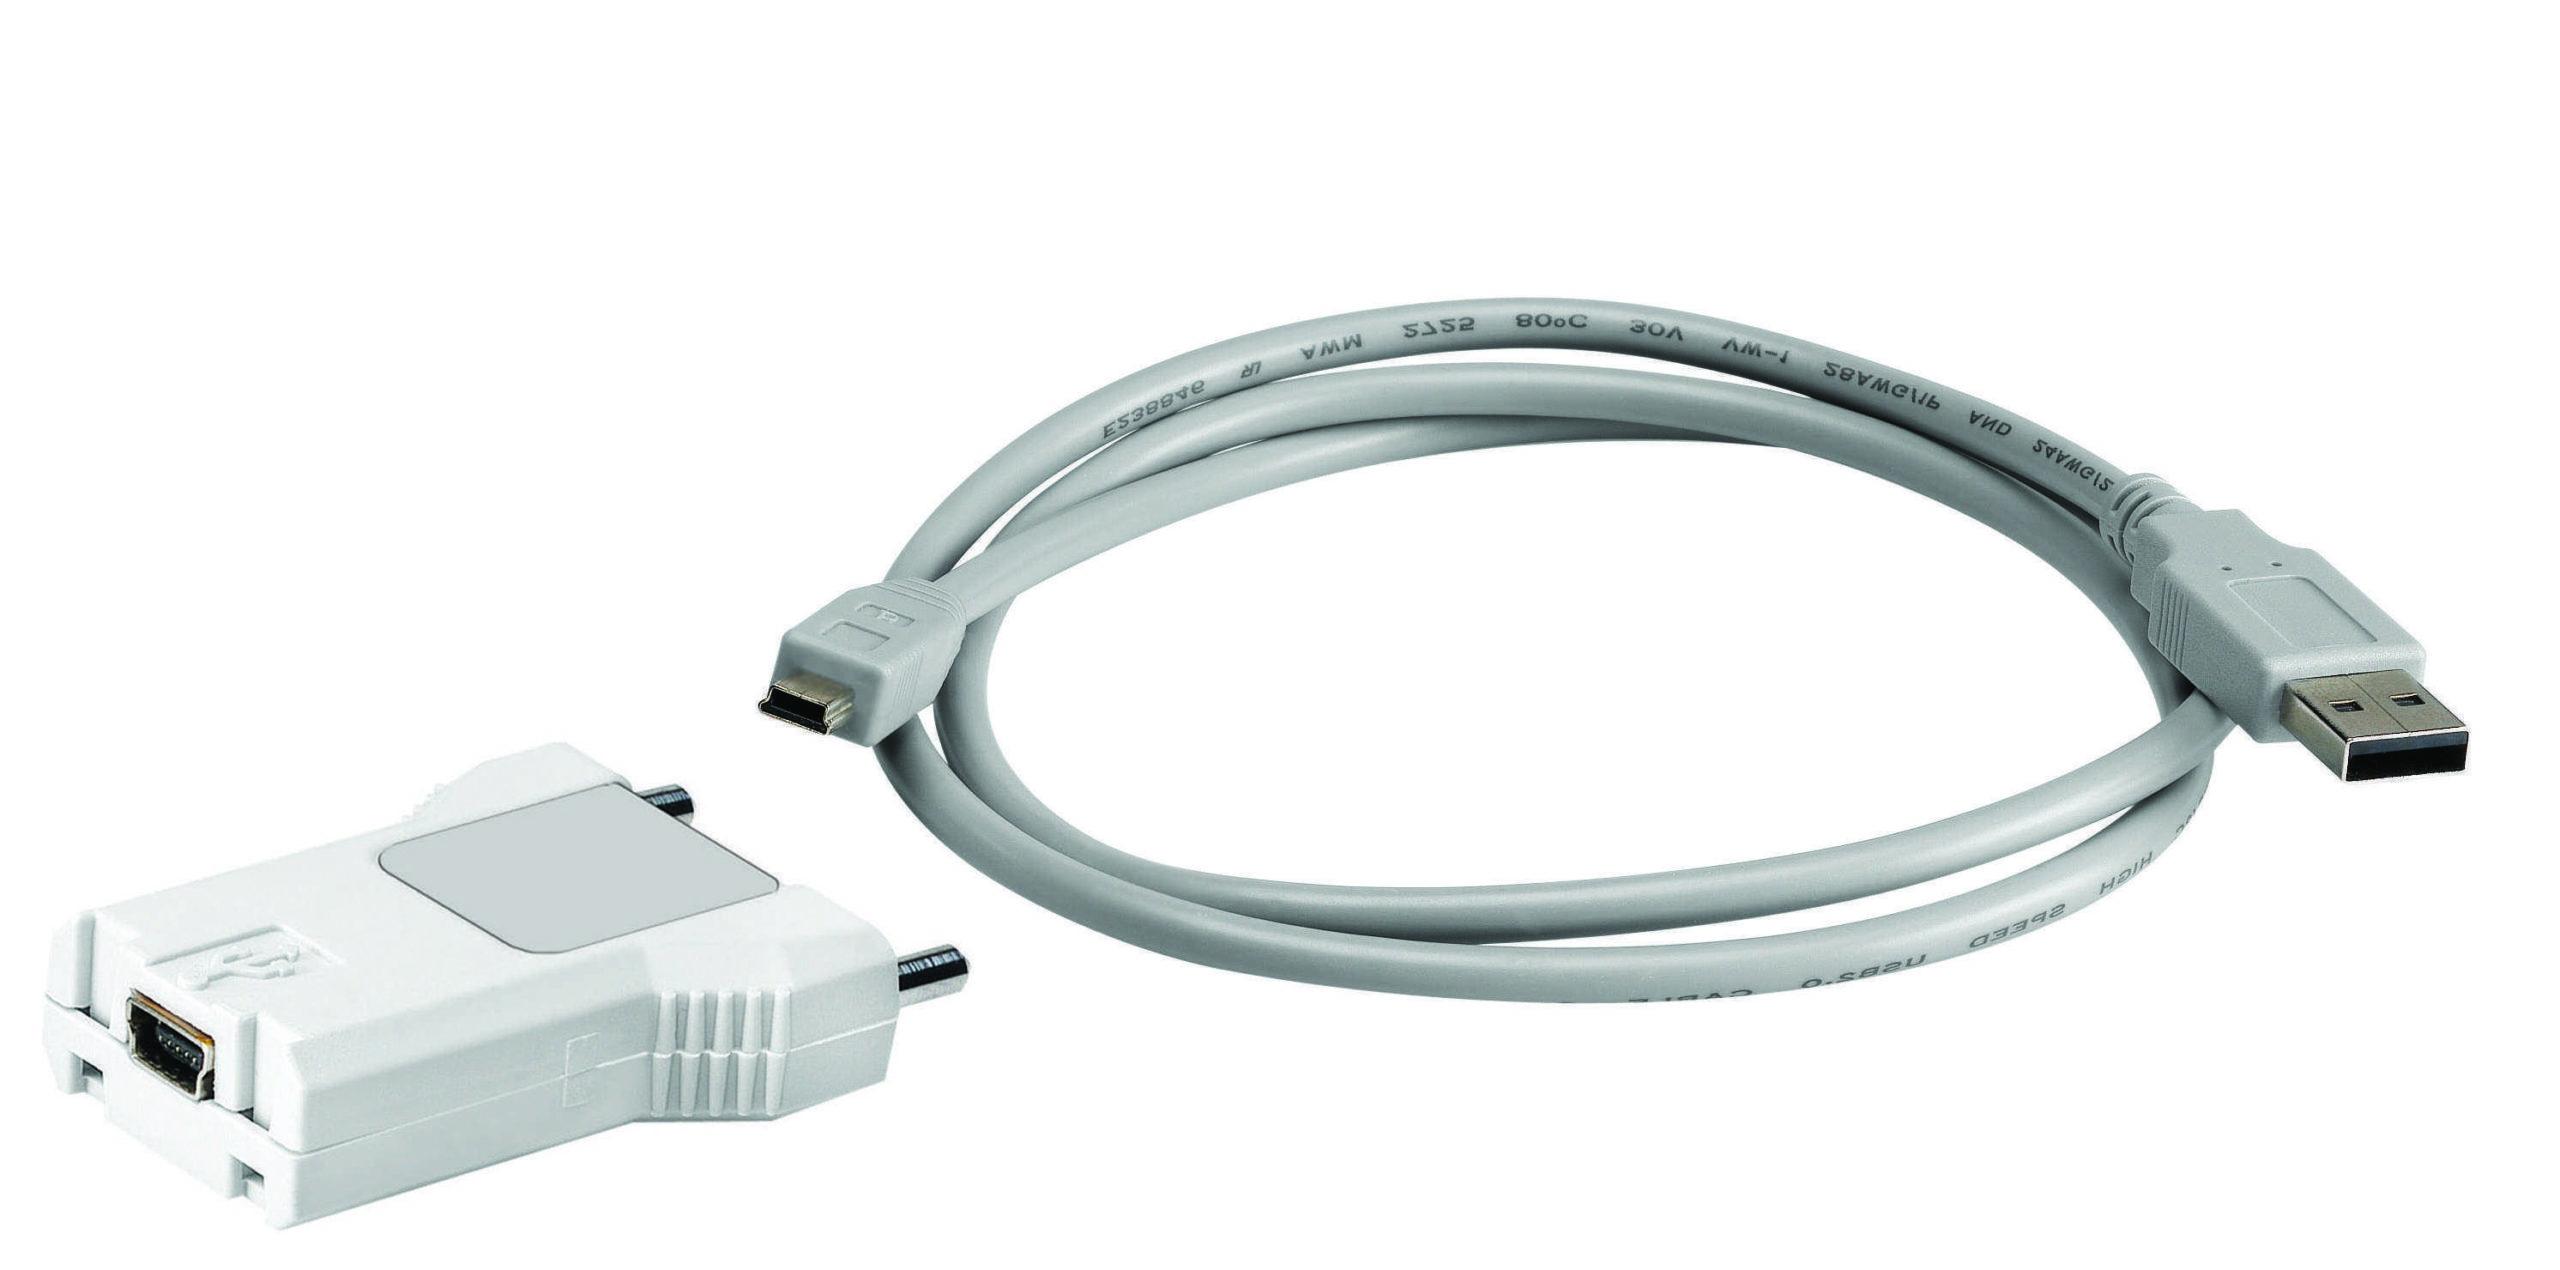 CX 01 - 02 Measuring Accessories - Communication Devices